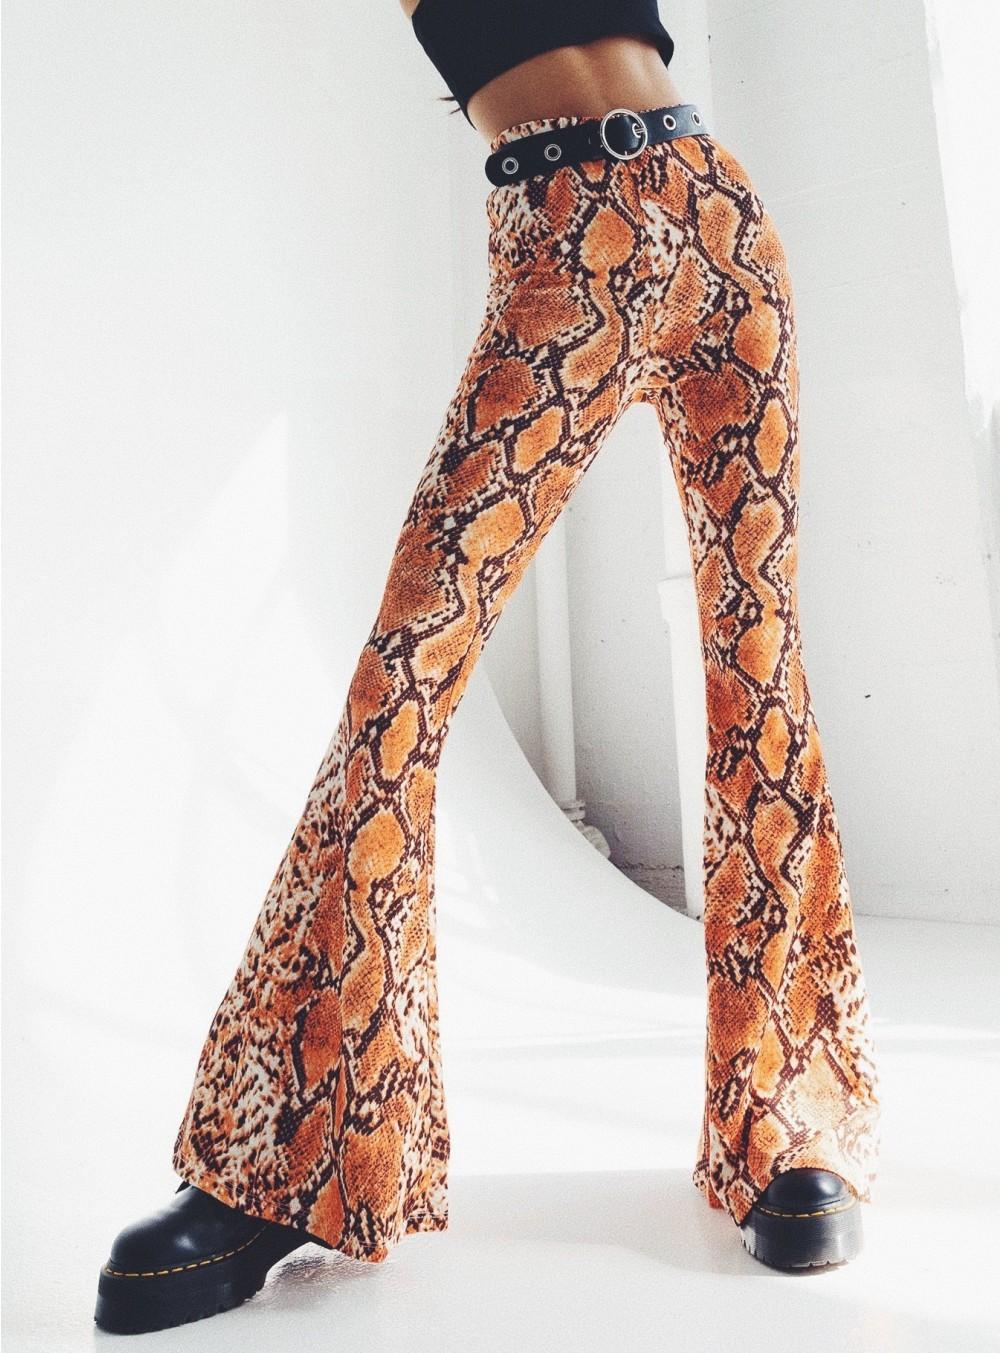 Snakeskin Pants